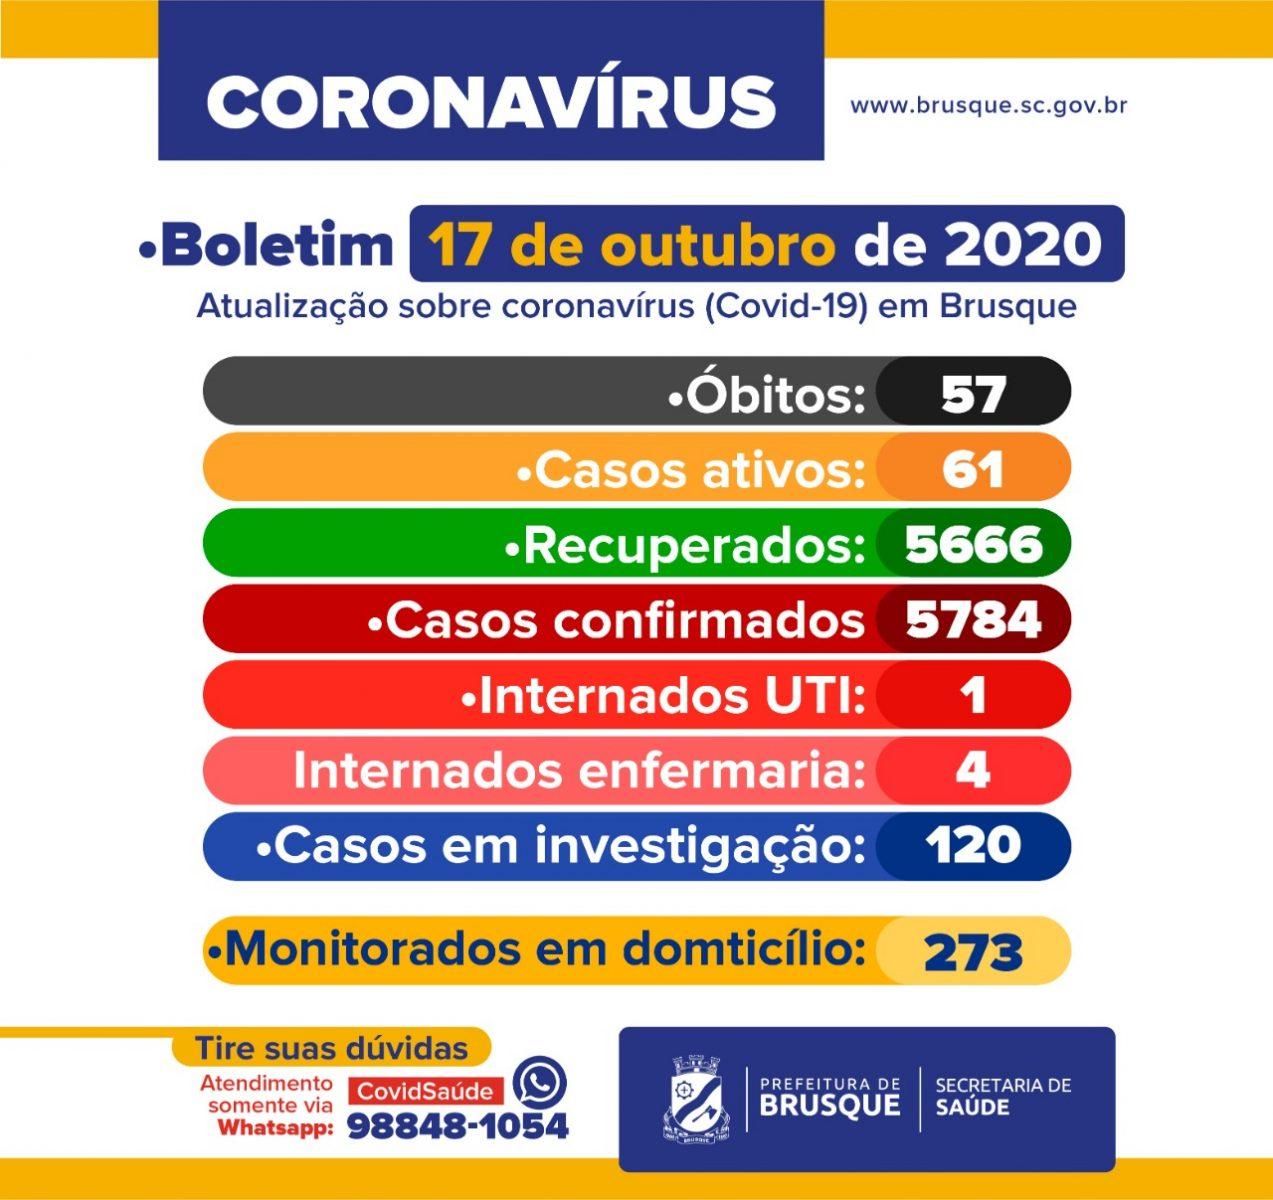 COVID-19: Boletim epidemiológico 17 de outubro